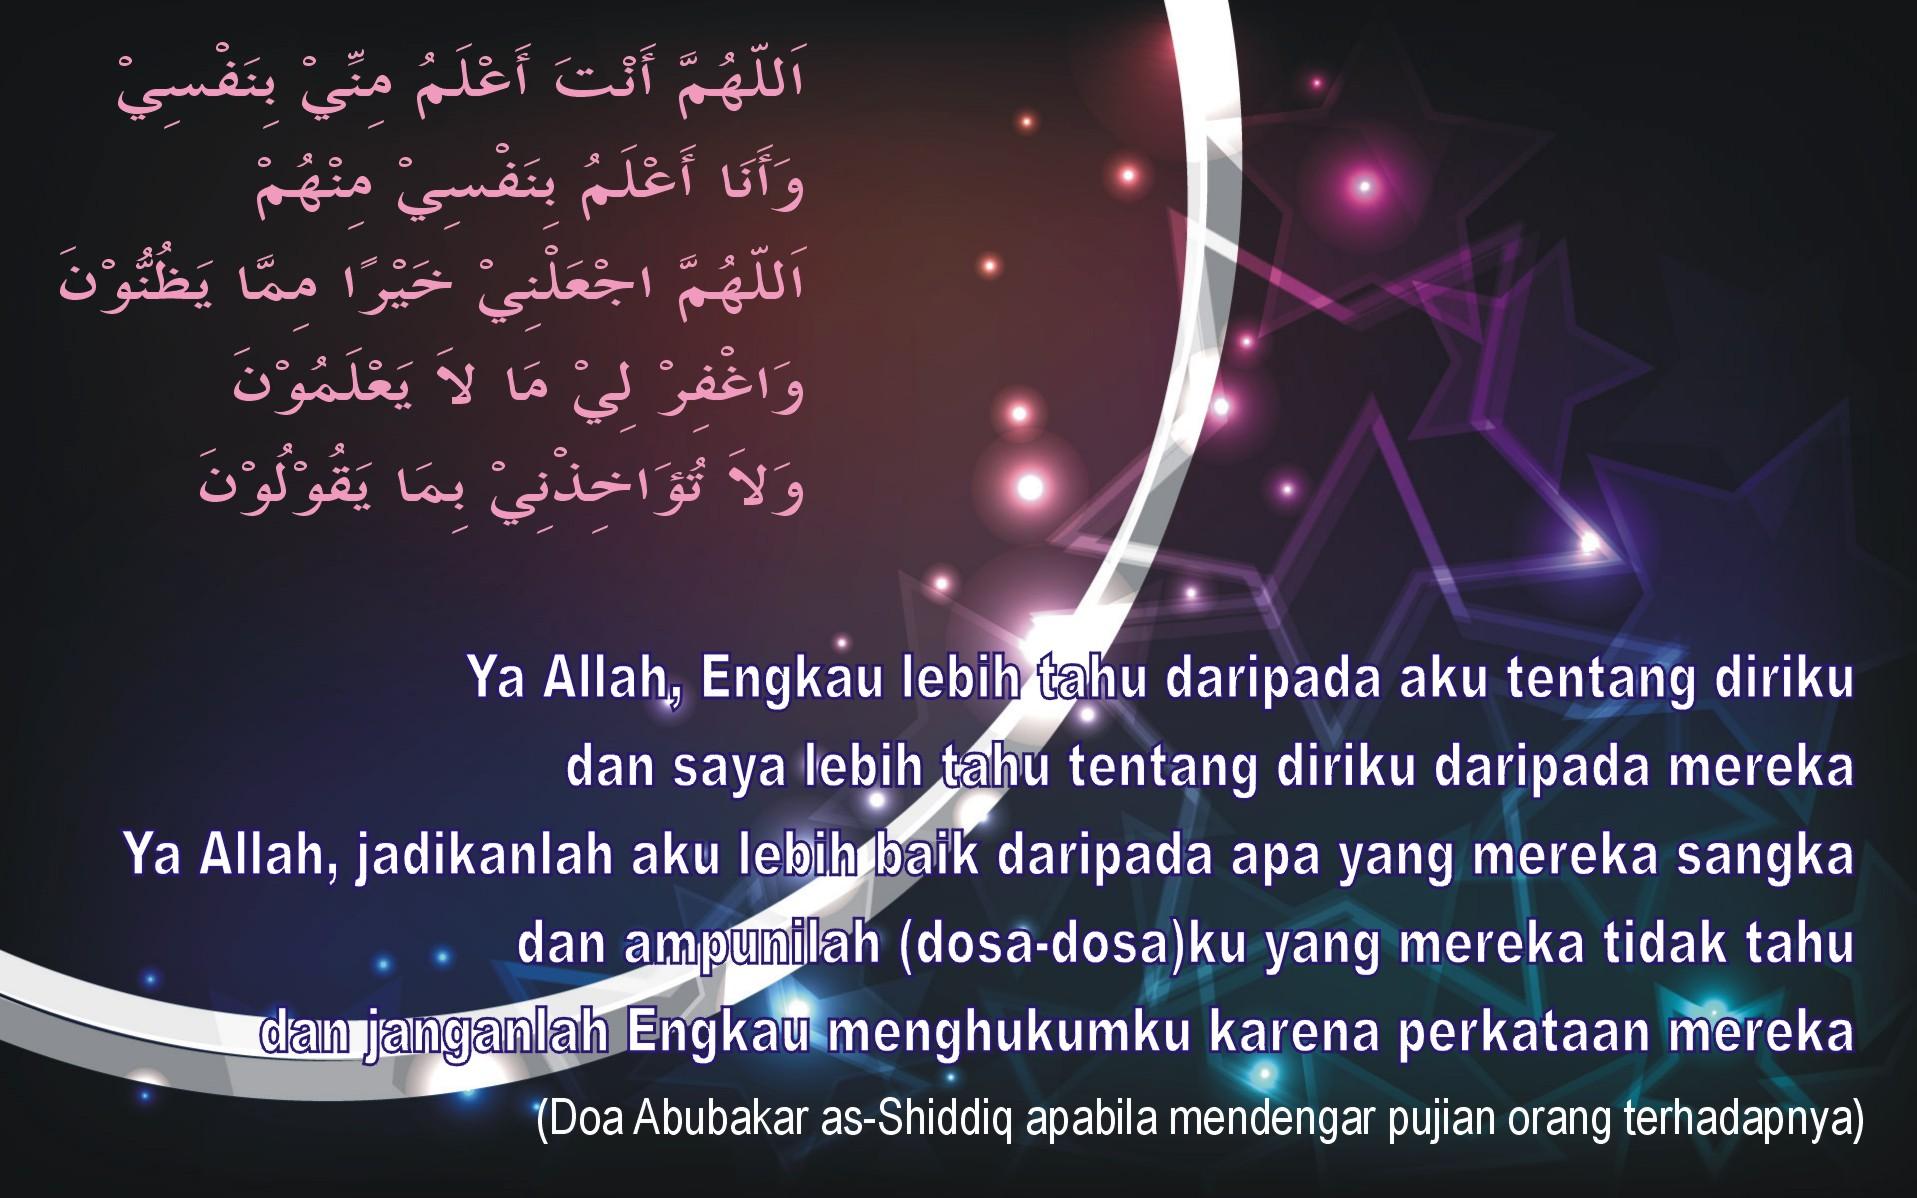 Wallpaper Indah Dengan Pesan Islami MI ISLAMIYAH ALWATHANIYAH